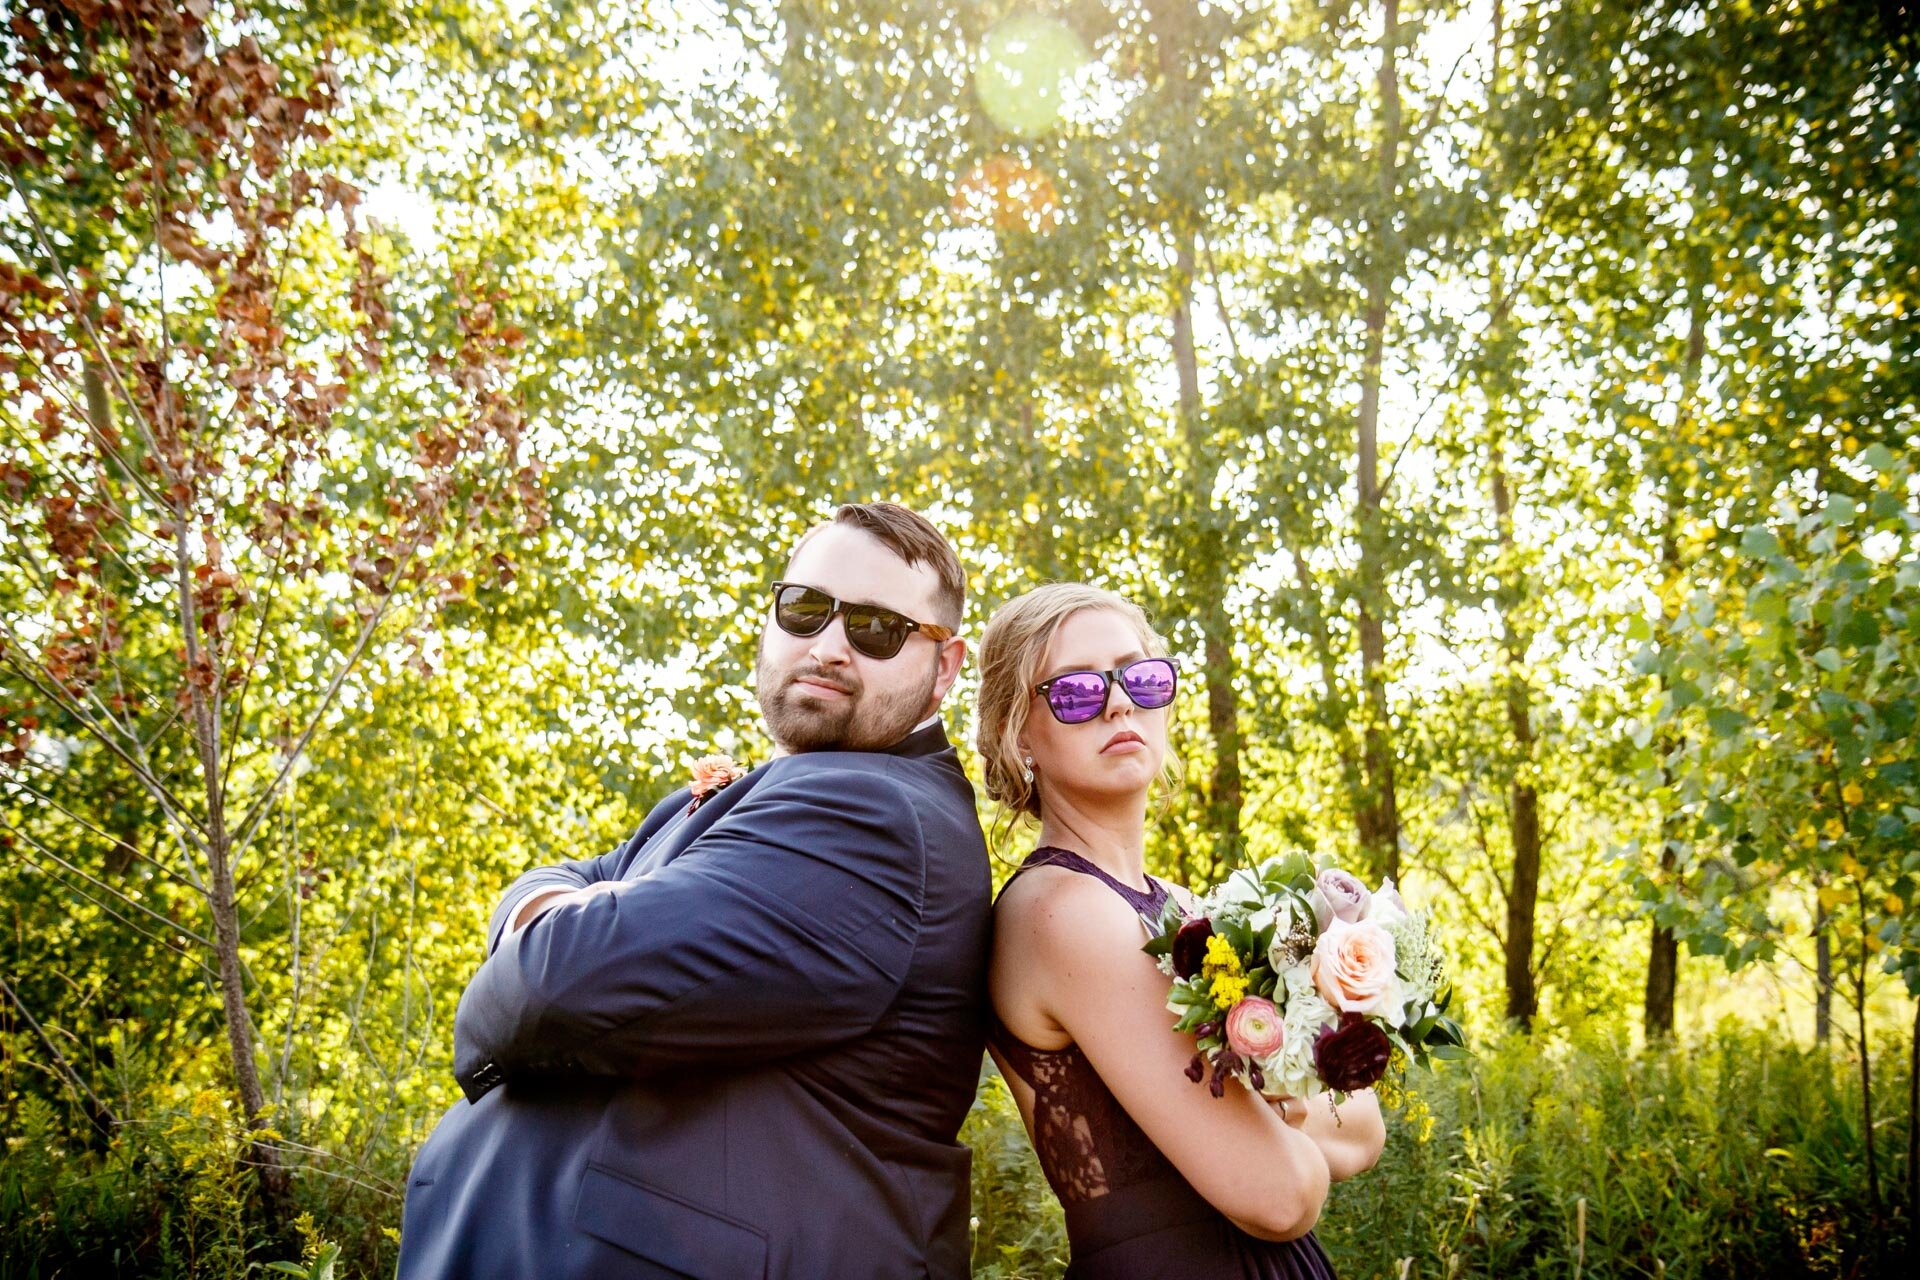 fall-lighting-adam-shea-photography-wedding-engagement-blog-adam-shea-photography-green-bay-appleton-neenah-photographer-14.jpg